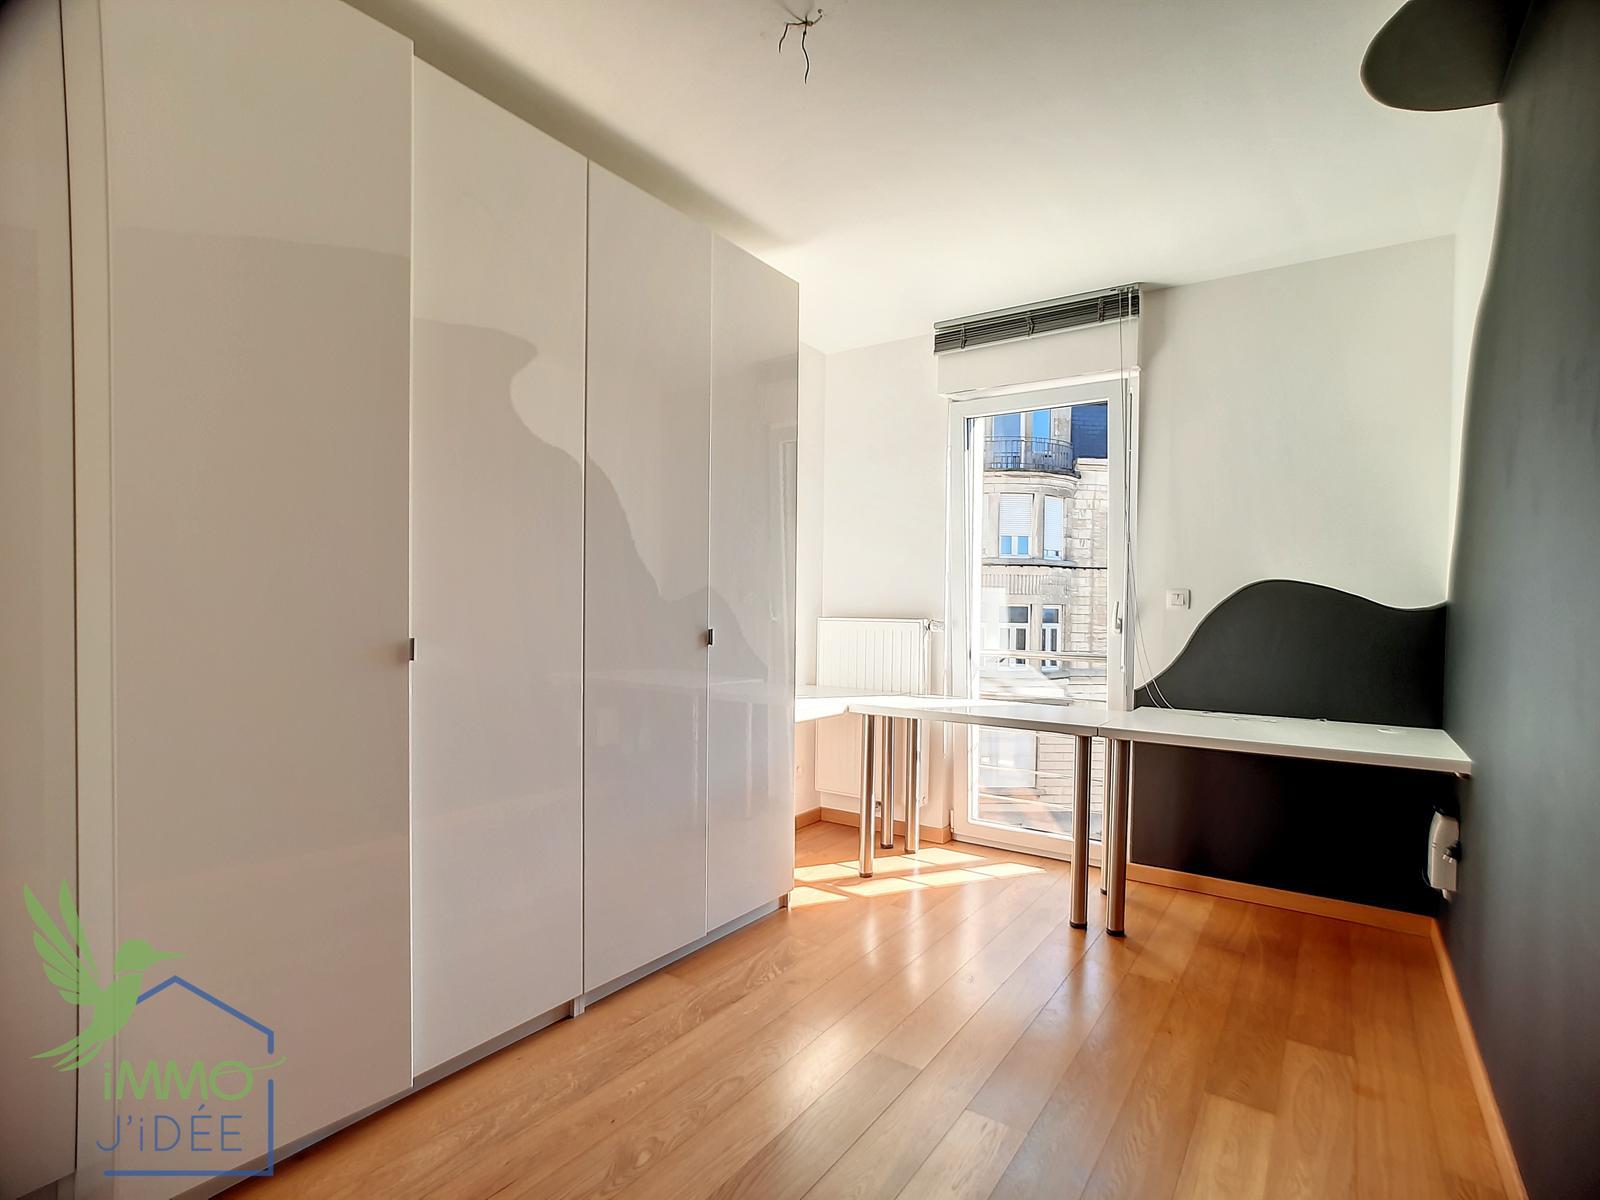 Appartement - Arlon - #4533660-5